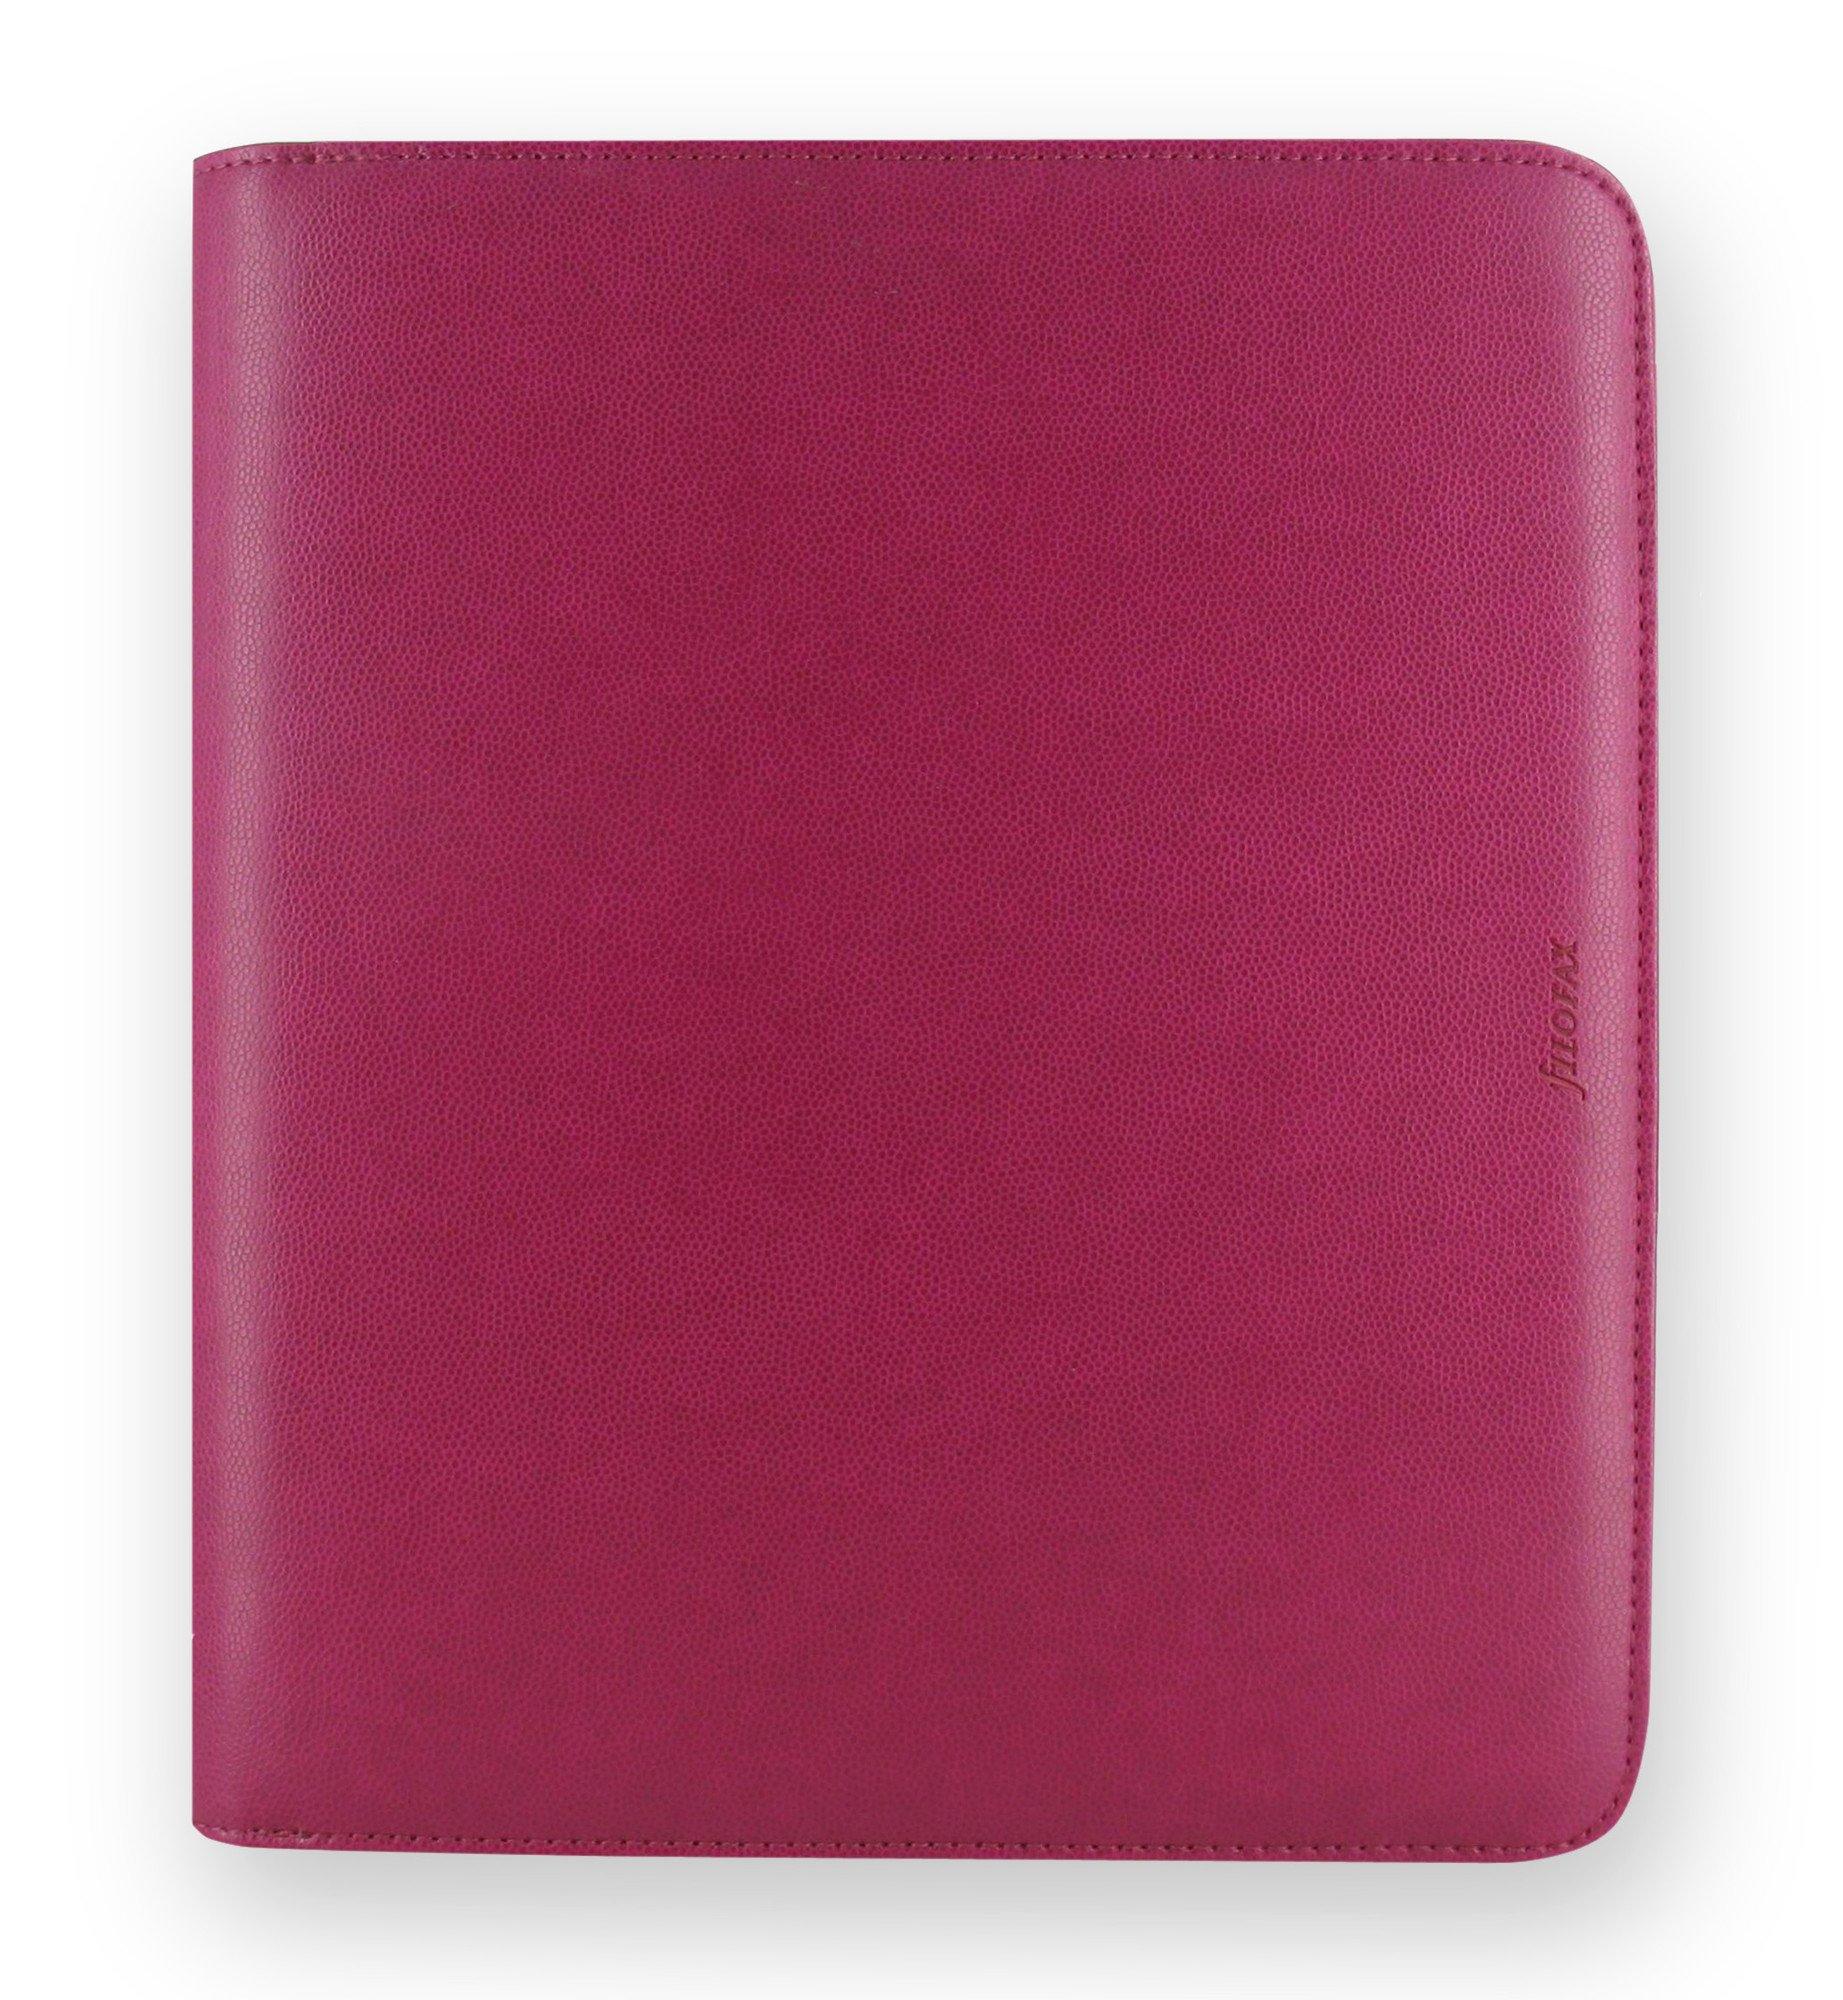 Filofax Pennybridge Raspberry iPad Holder A5 Organizer - FF-028037